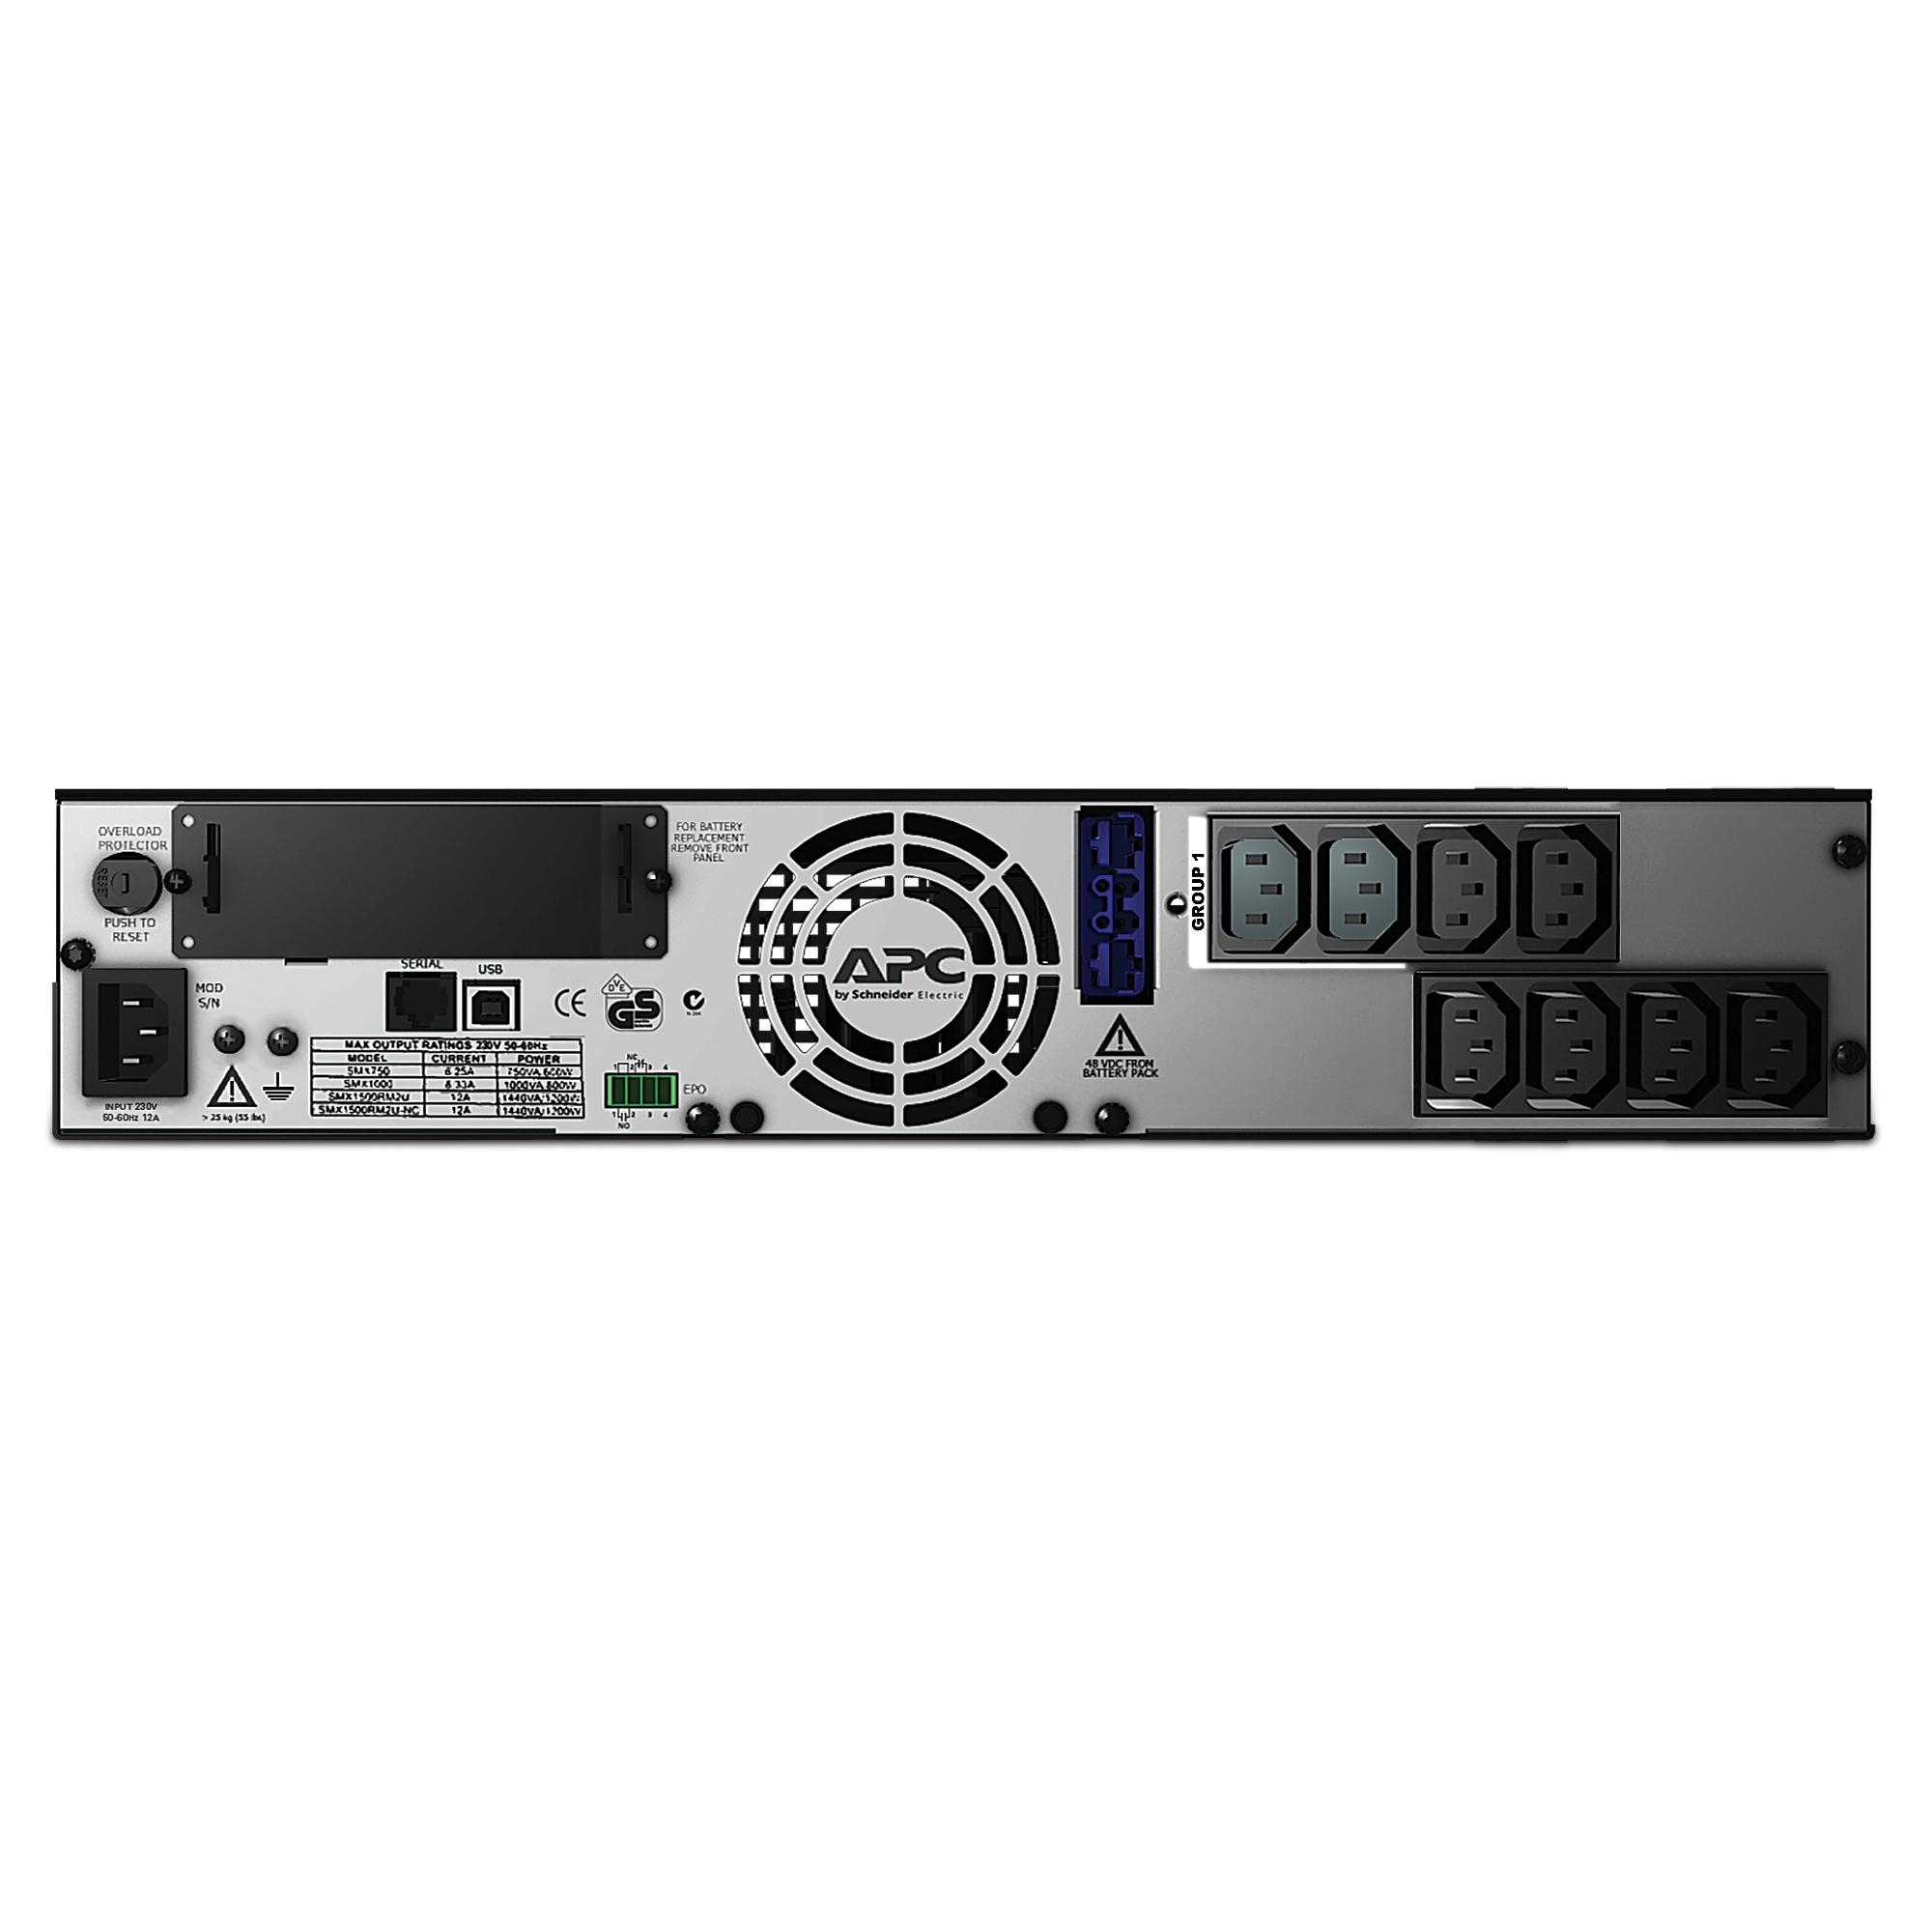 SMX750I Smart-UPS X (750 VA, Rack/Tower, LCD, rack-mountable, 600 Watt, 750 VA, 8 output connectors, 2U)